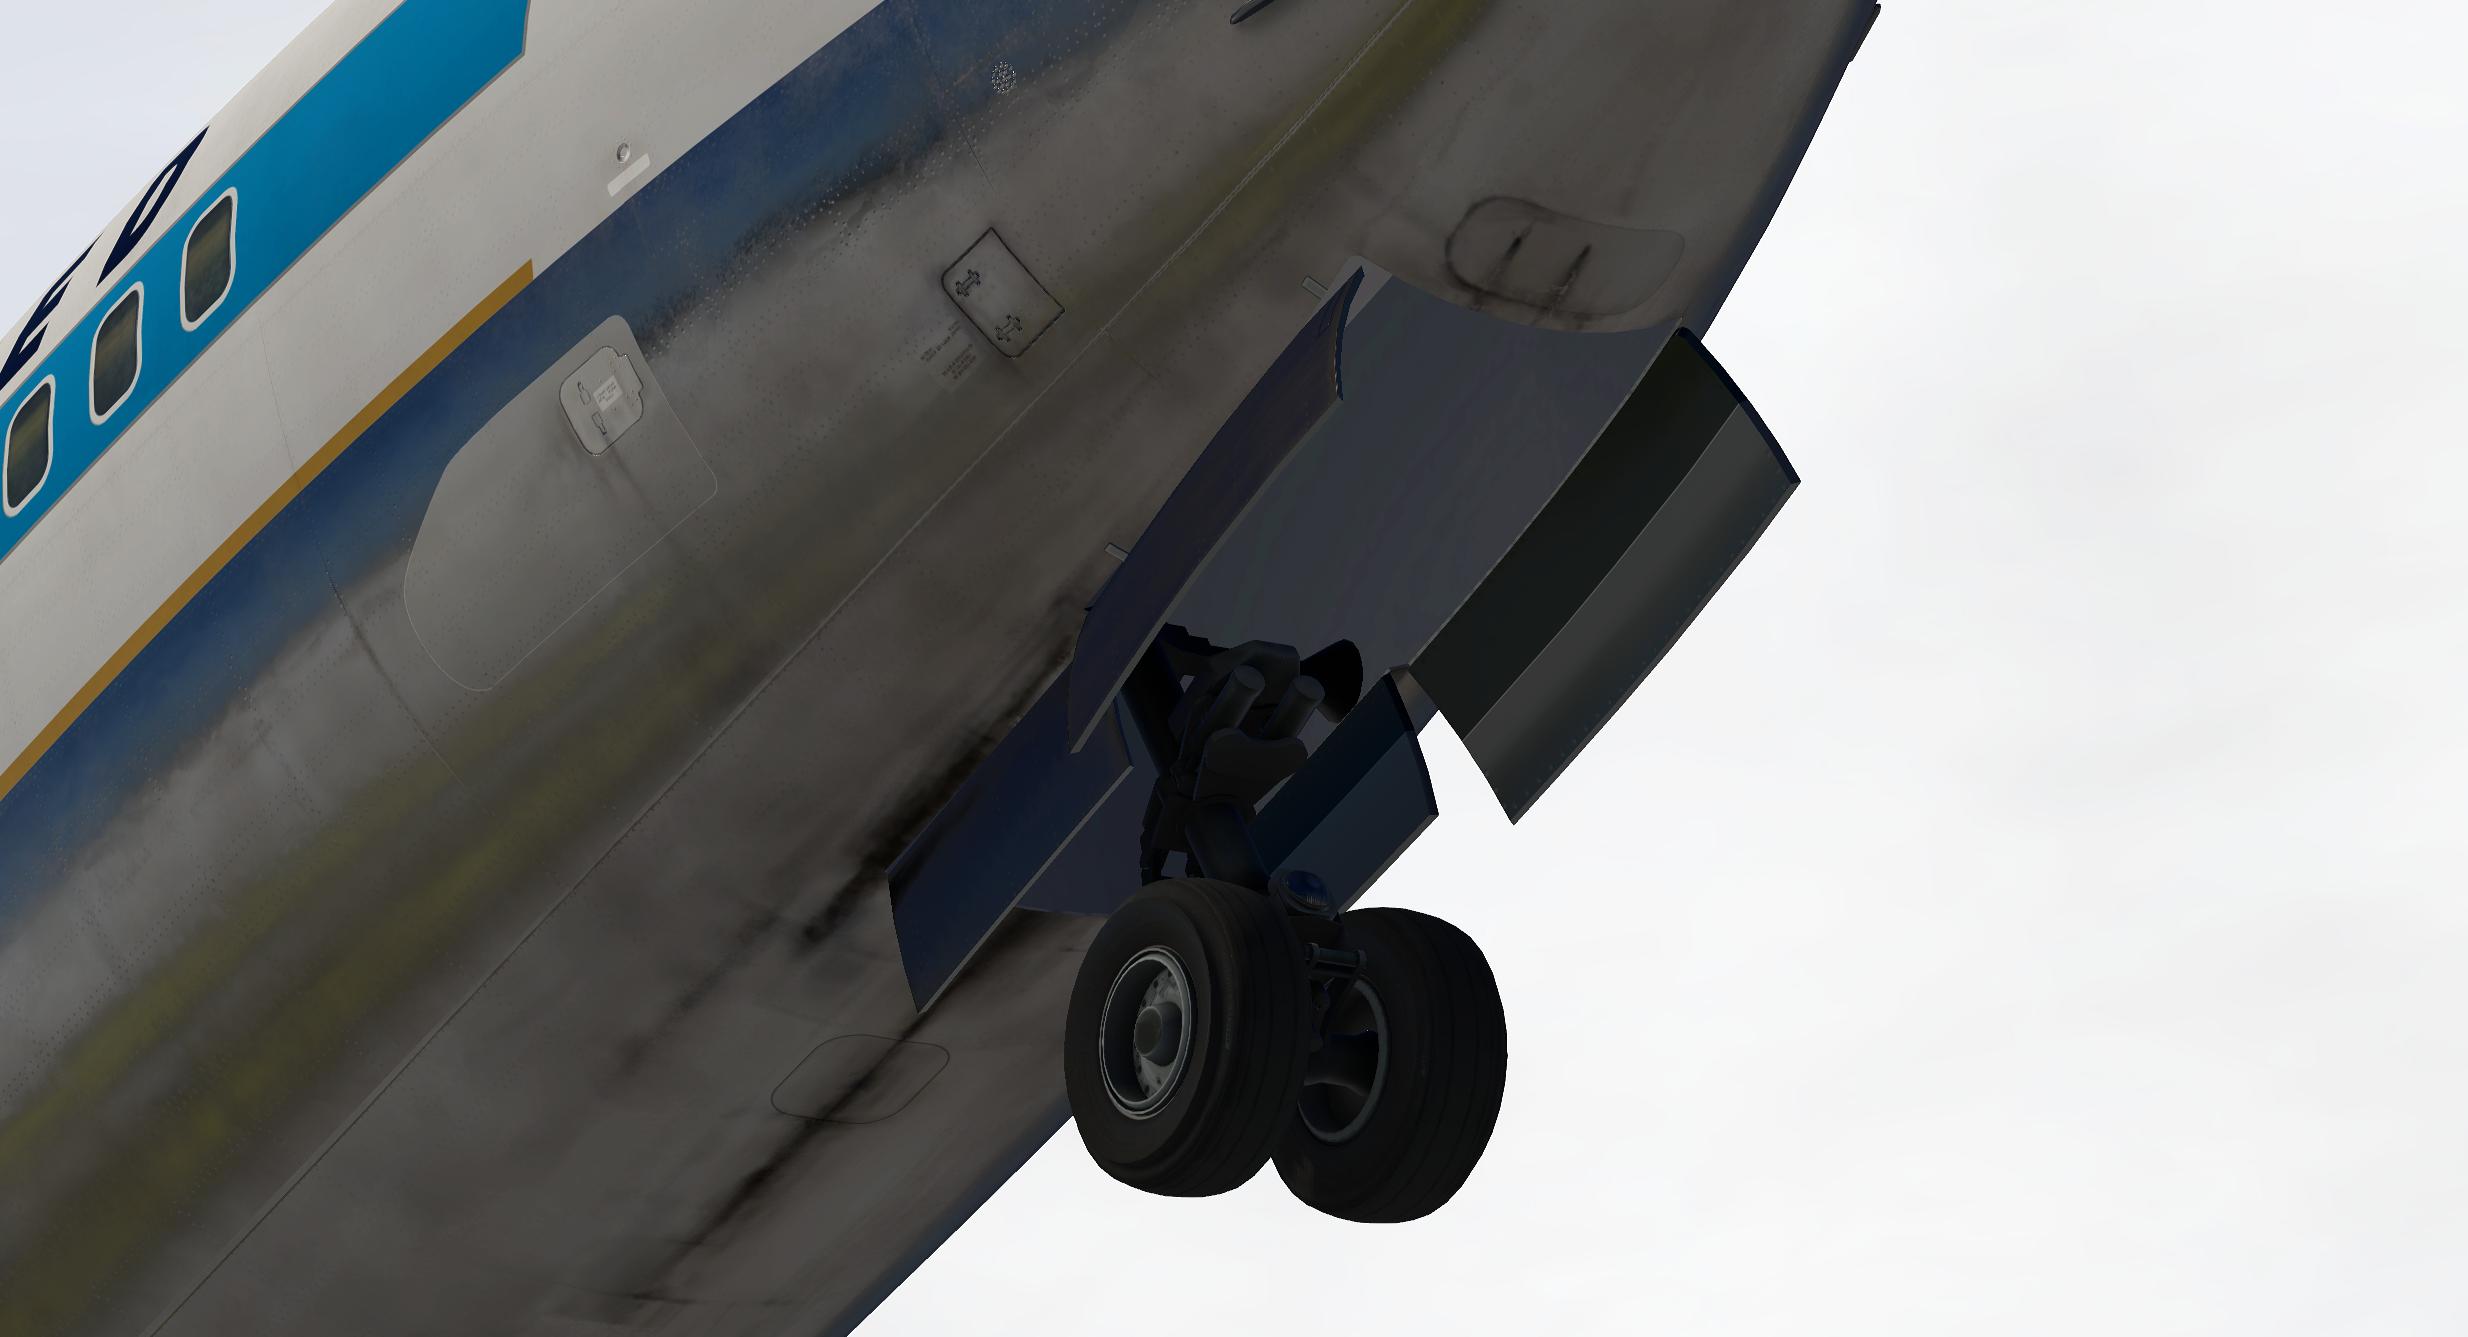 flyjsim 737 manual